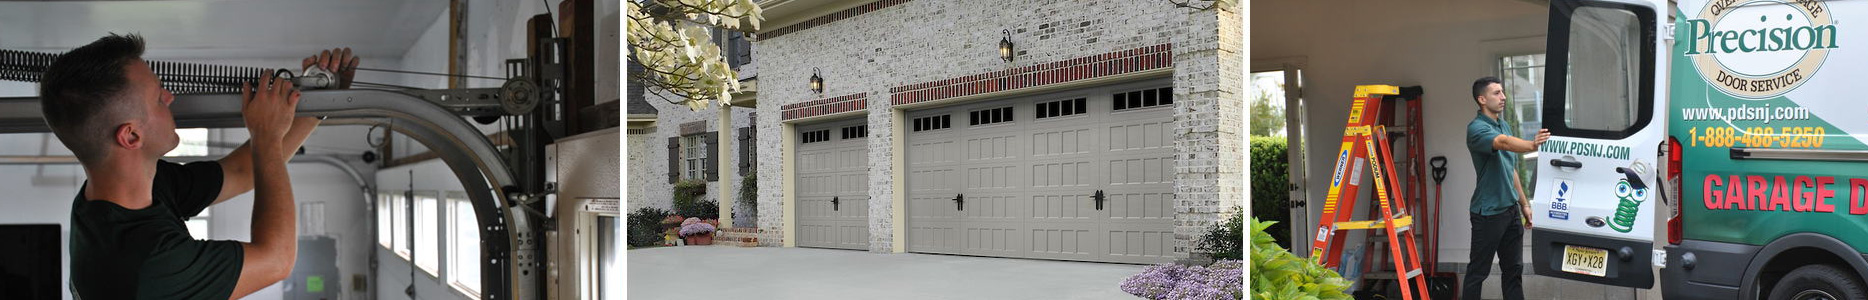 Precision Garage Door Repair Westchester County Ny We